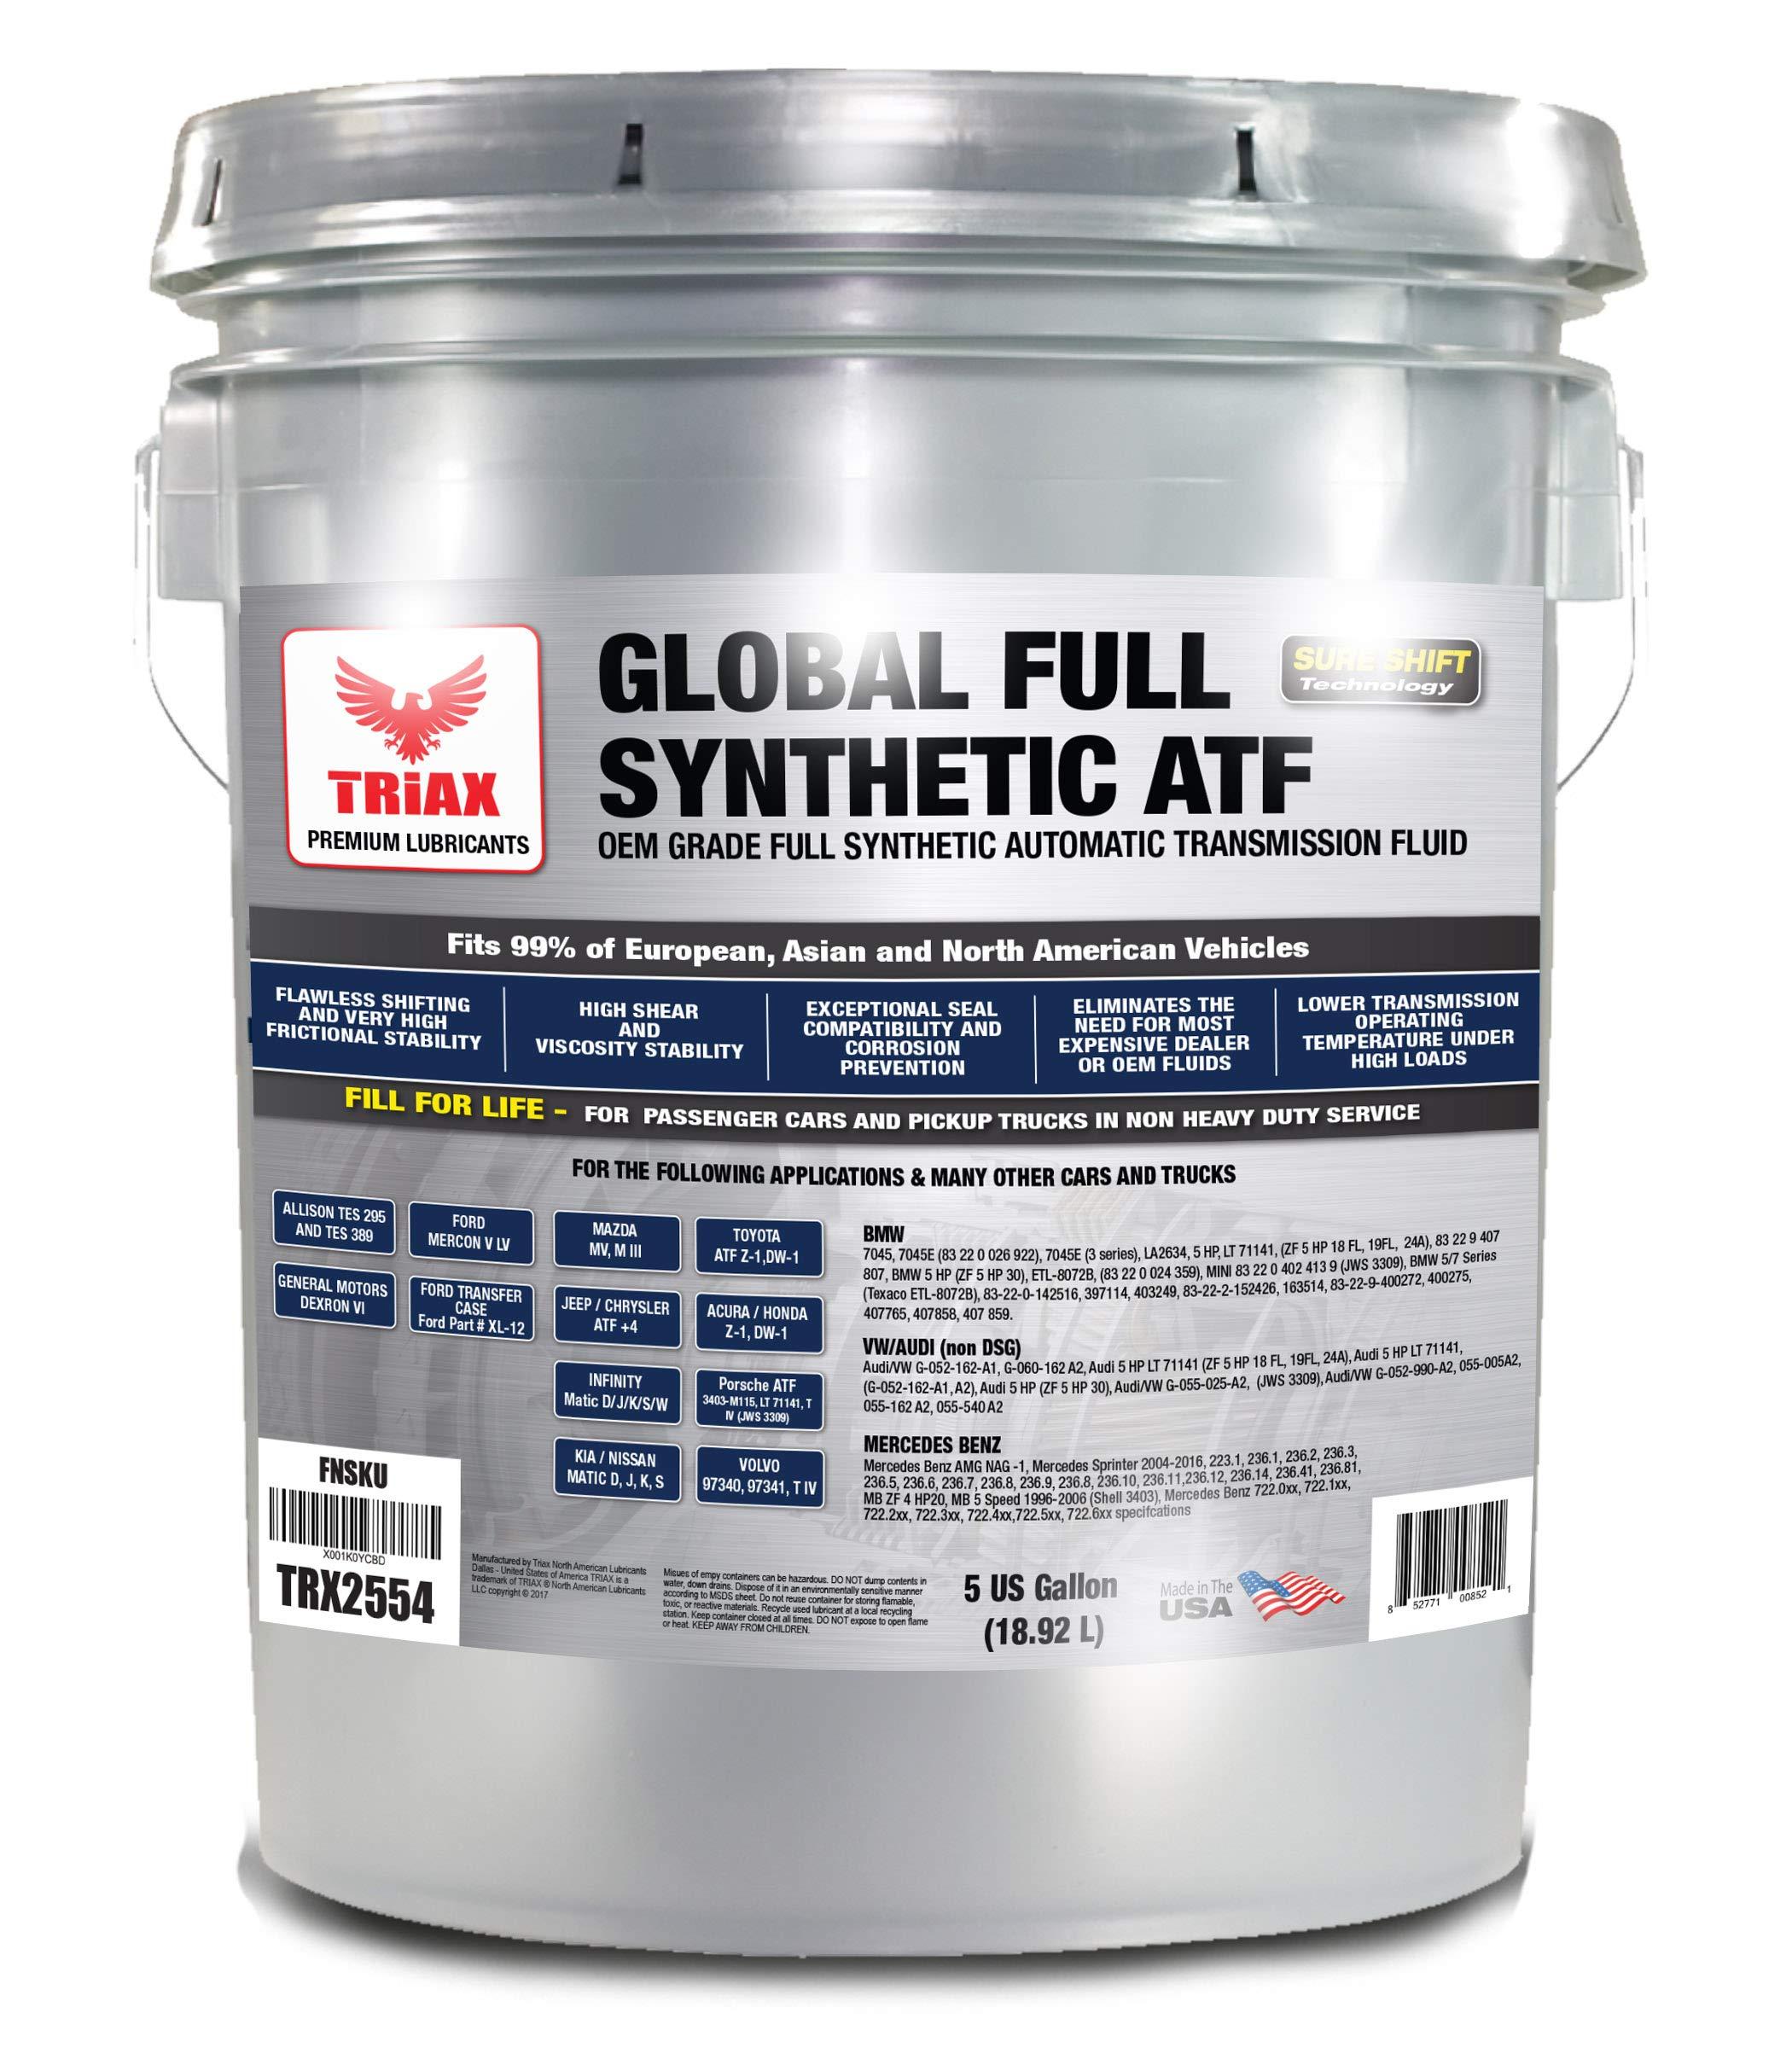 Triax Global Synthetic ATF - OEM Grade for Allison TES 295, BMW, Audi, Mercedes Benz, VW, Honda, Toyota, Nissan, Chrysler +4, Ford Mercon V/LV, Dexron VI, Nissan, ZF 6HP (5 GAL Pail)